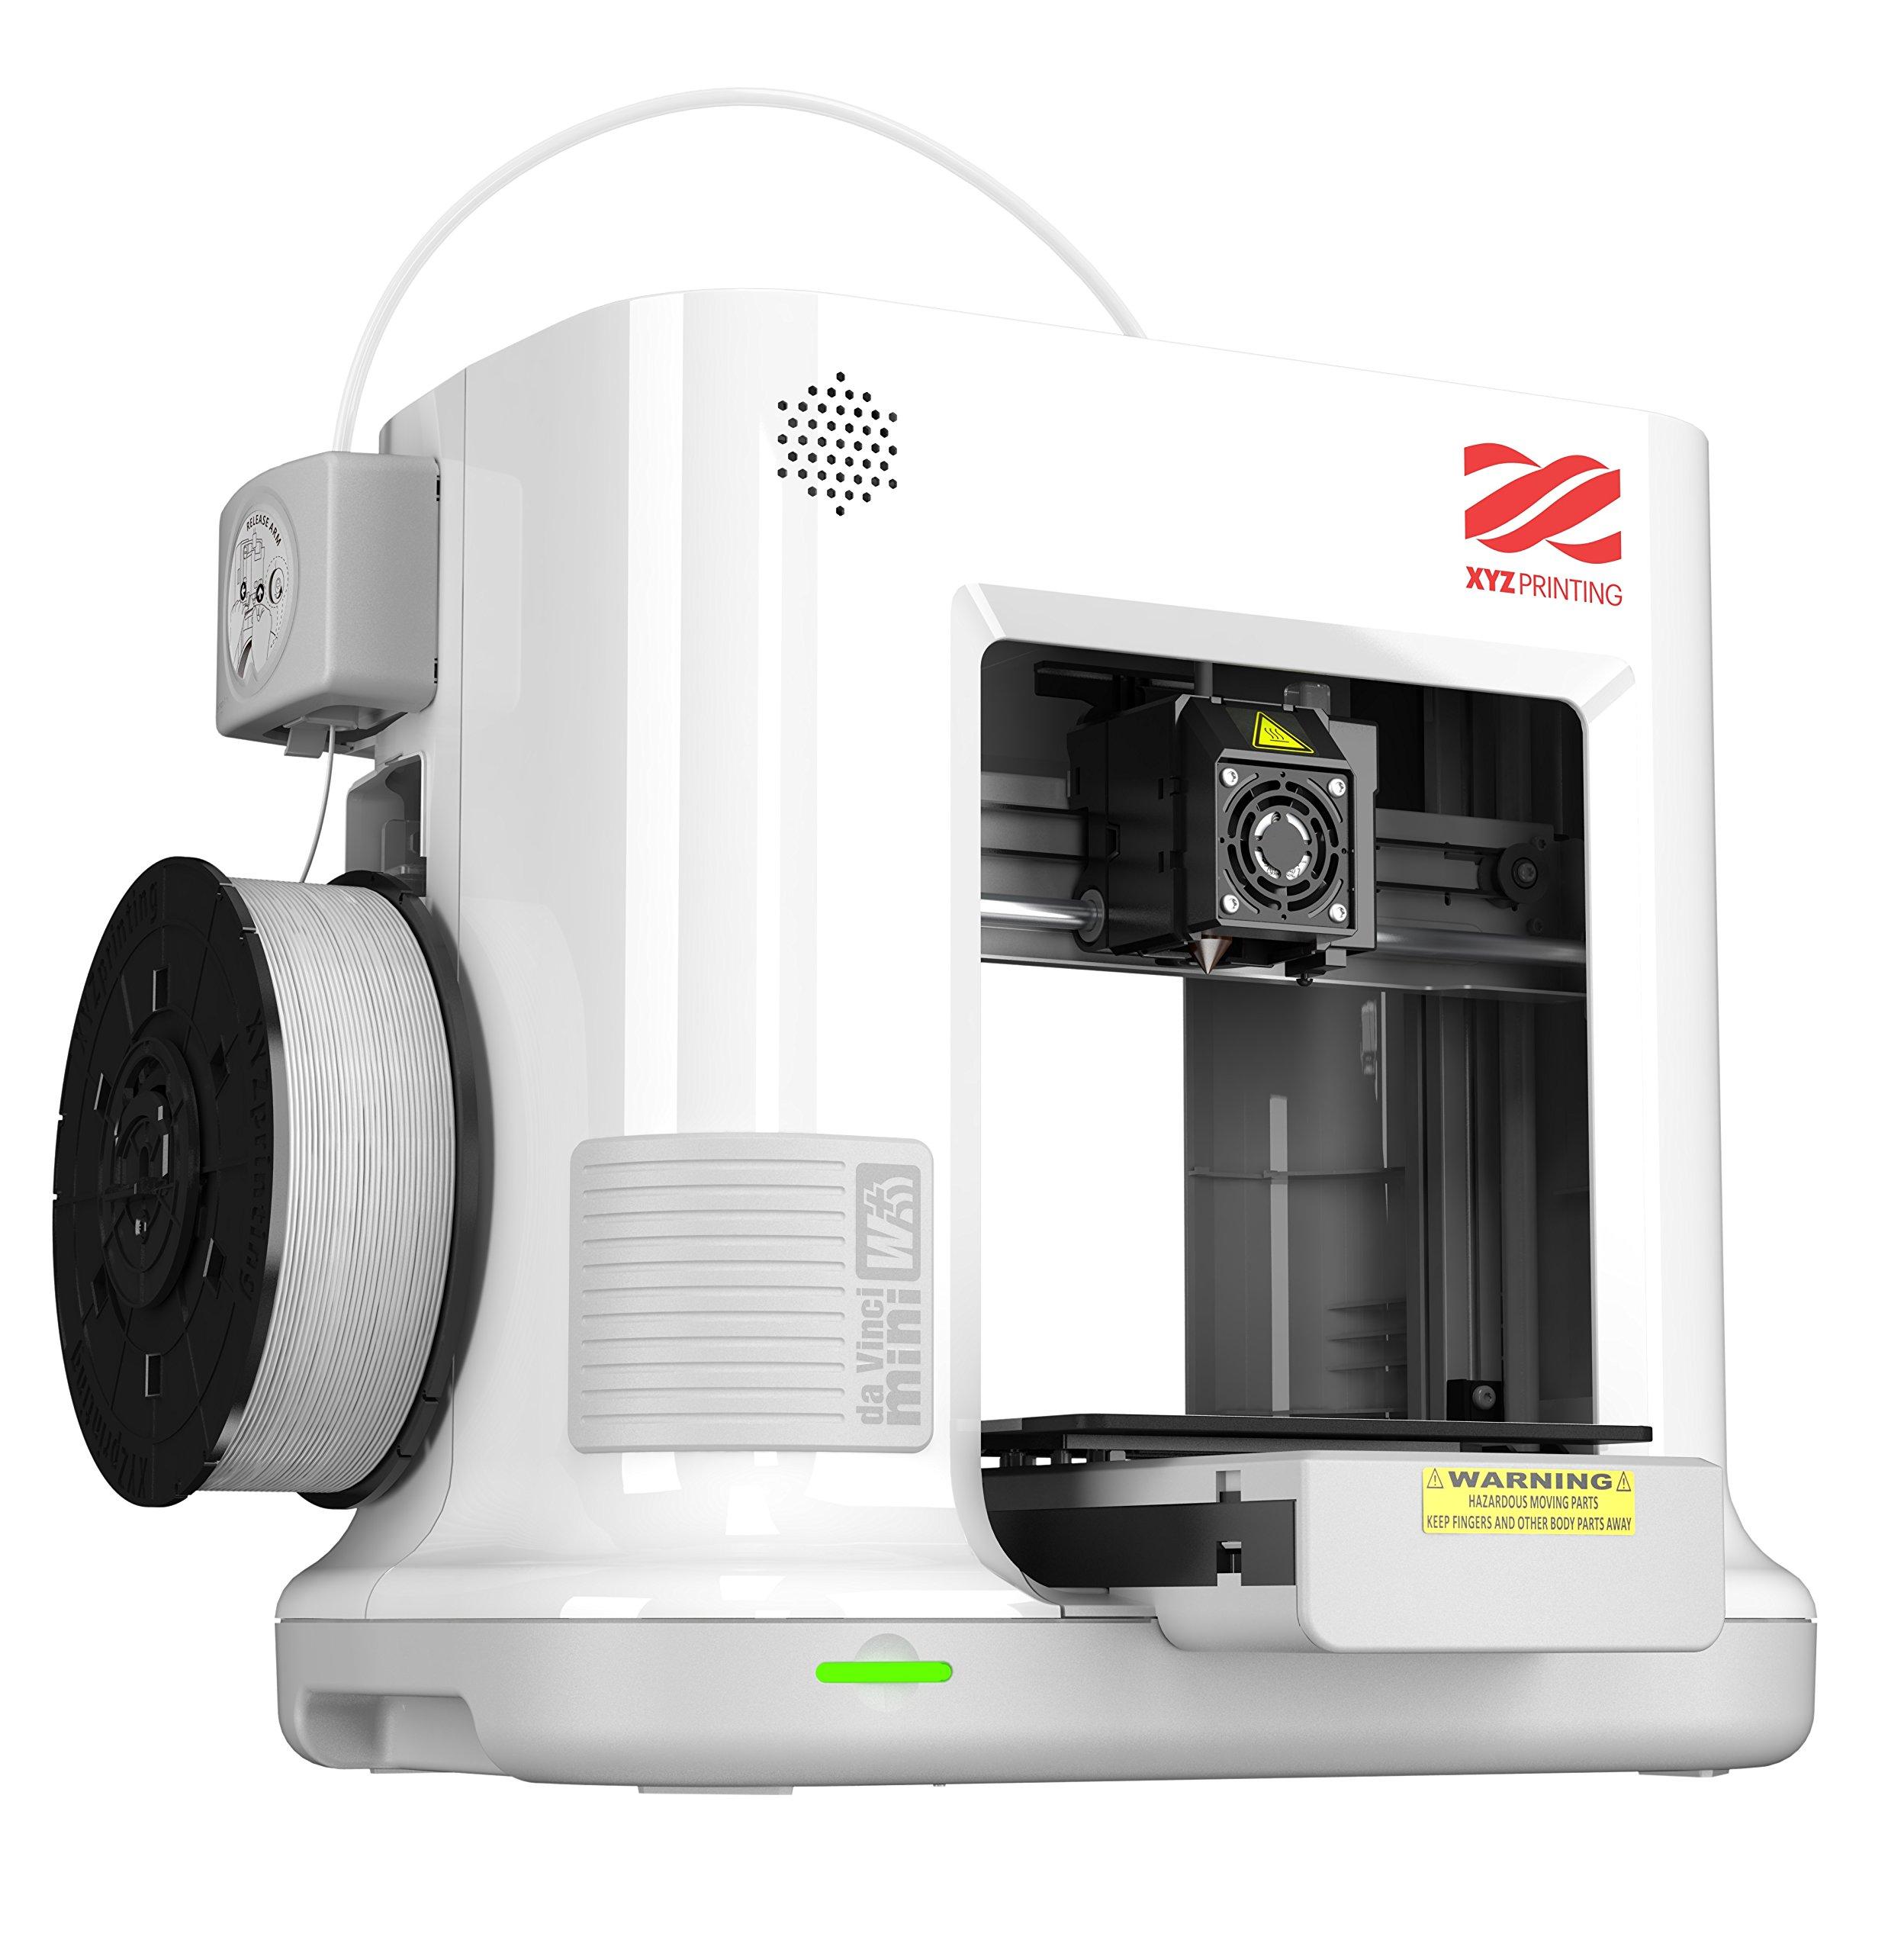 XYZ printing 3FM3WXEU00C Da Vinci MiniWifi Plus Impresora 3D